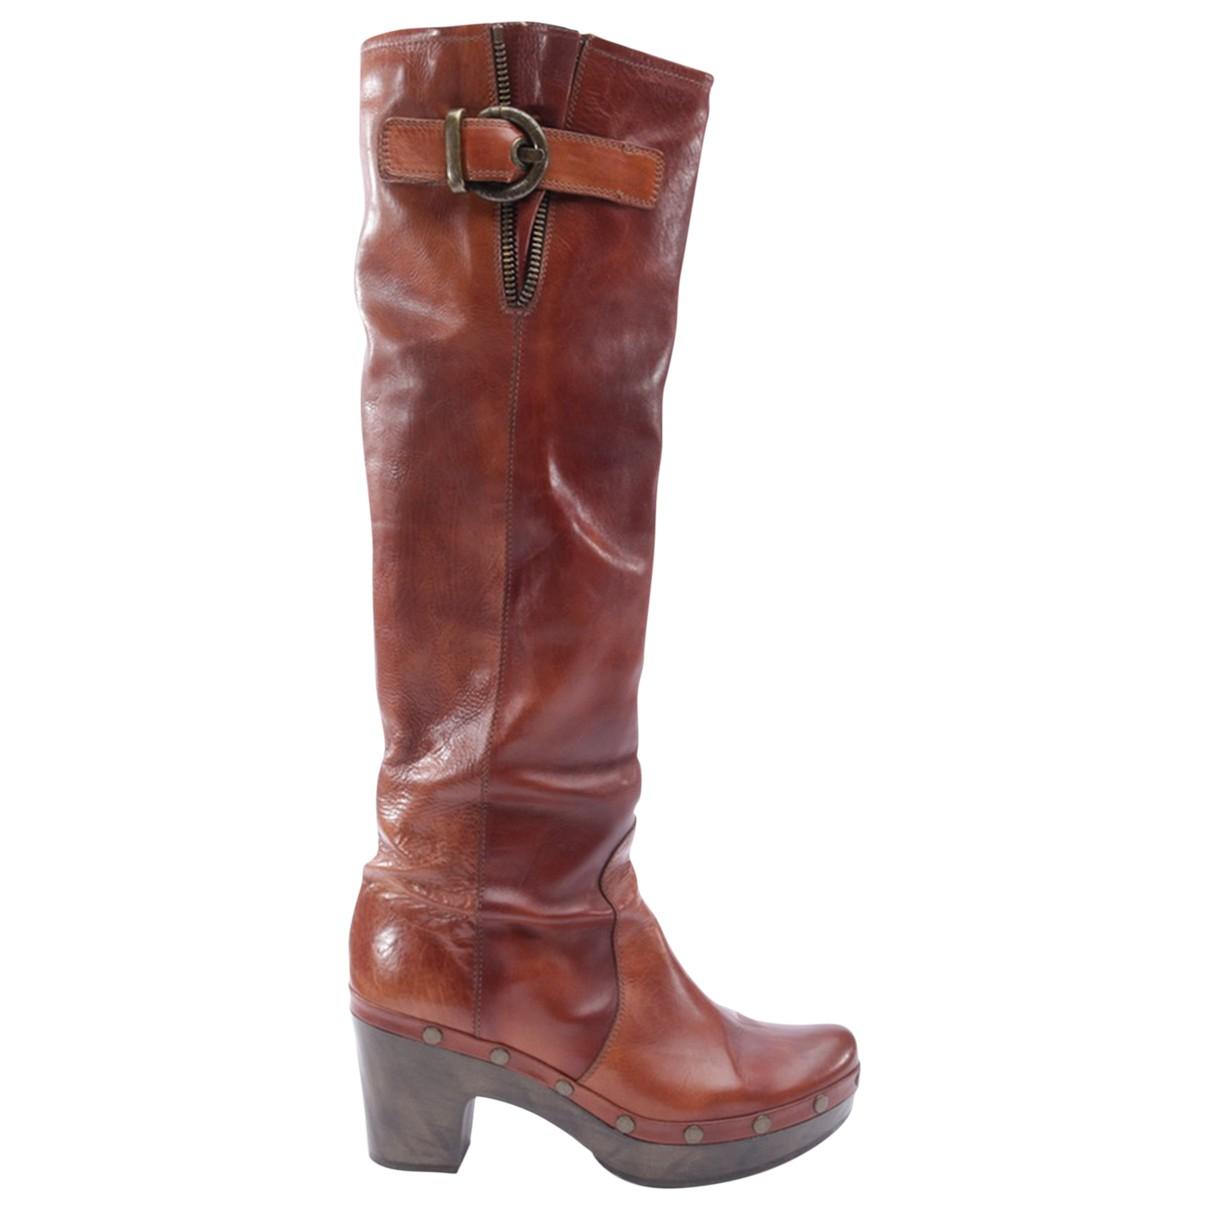 Stuart Weitzman N Brown Leather Boots for Women 40 EU